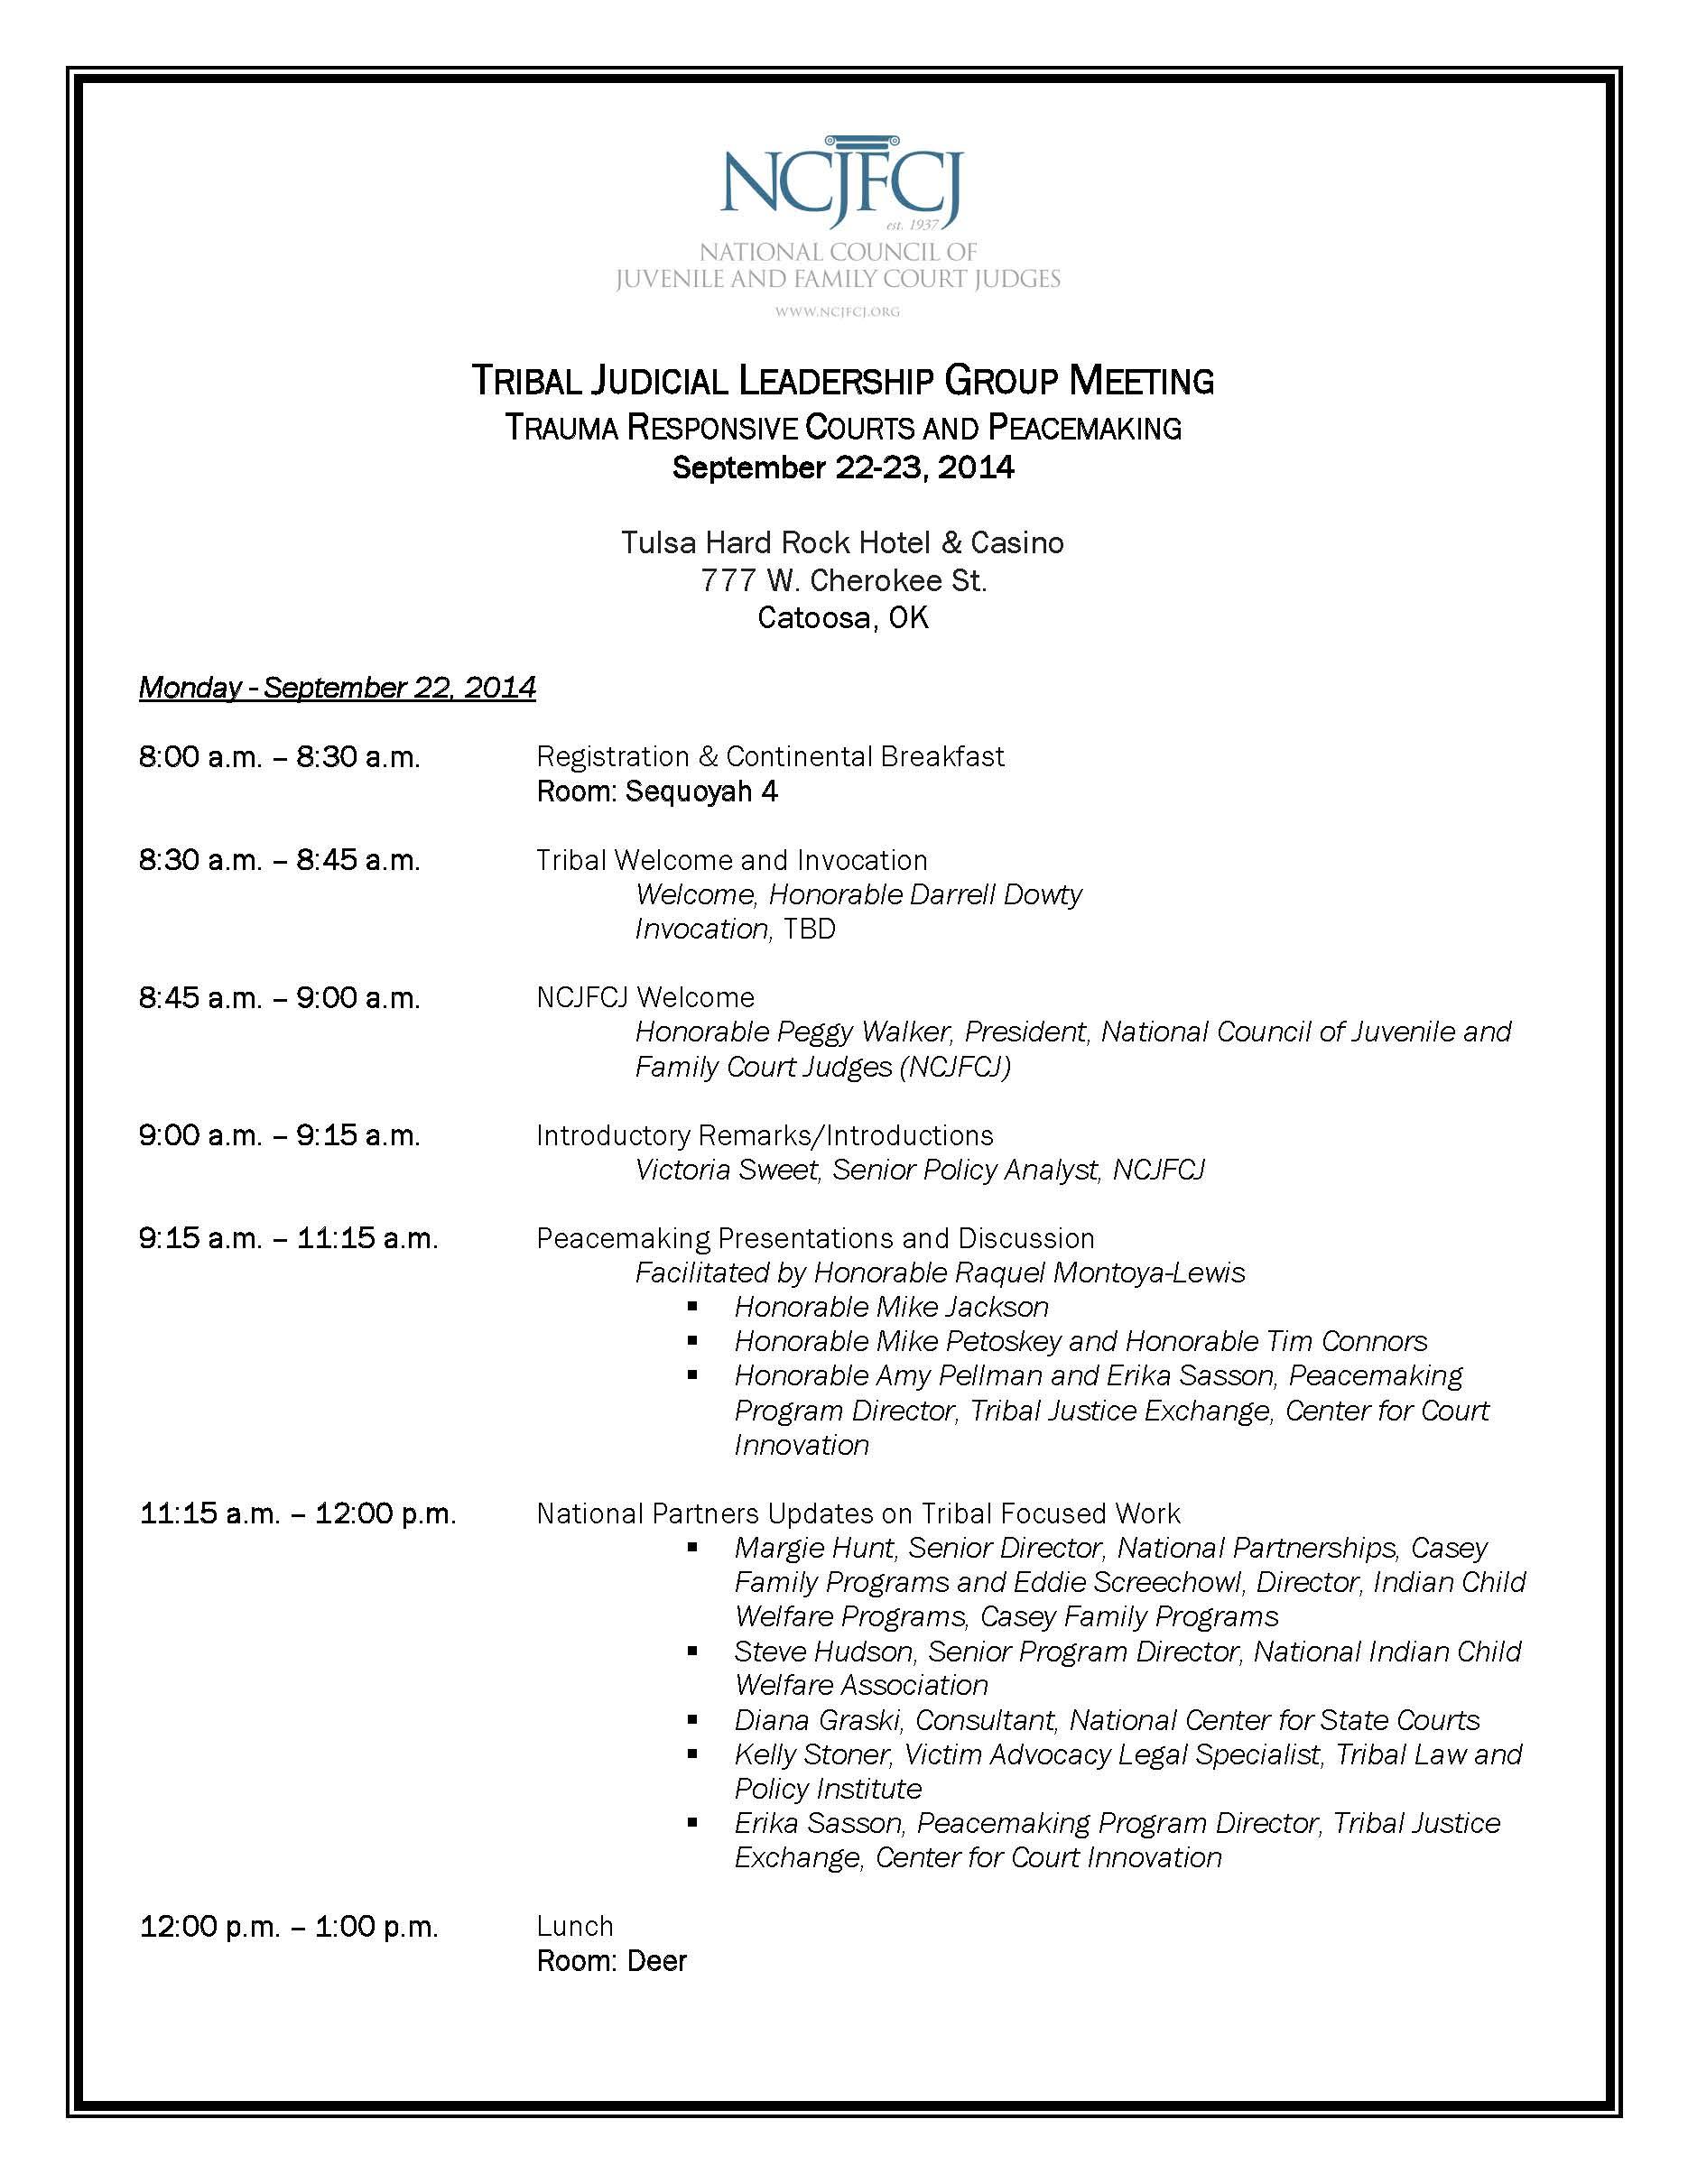 final agenda  u2013 tribal judicial leadership group meeting